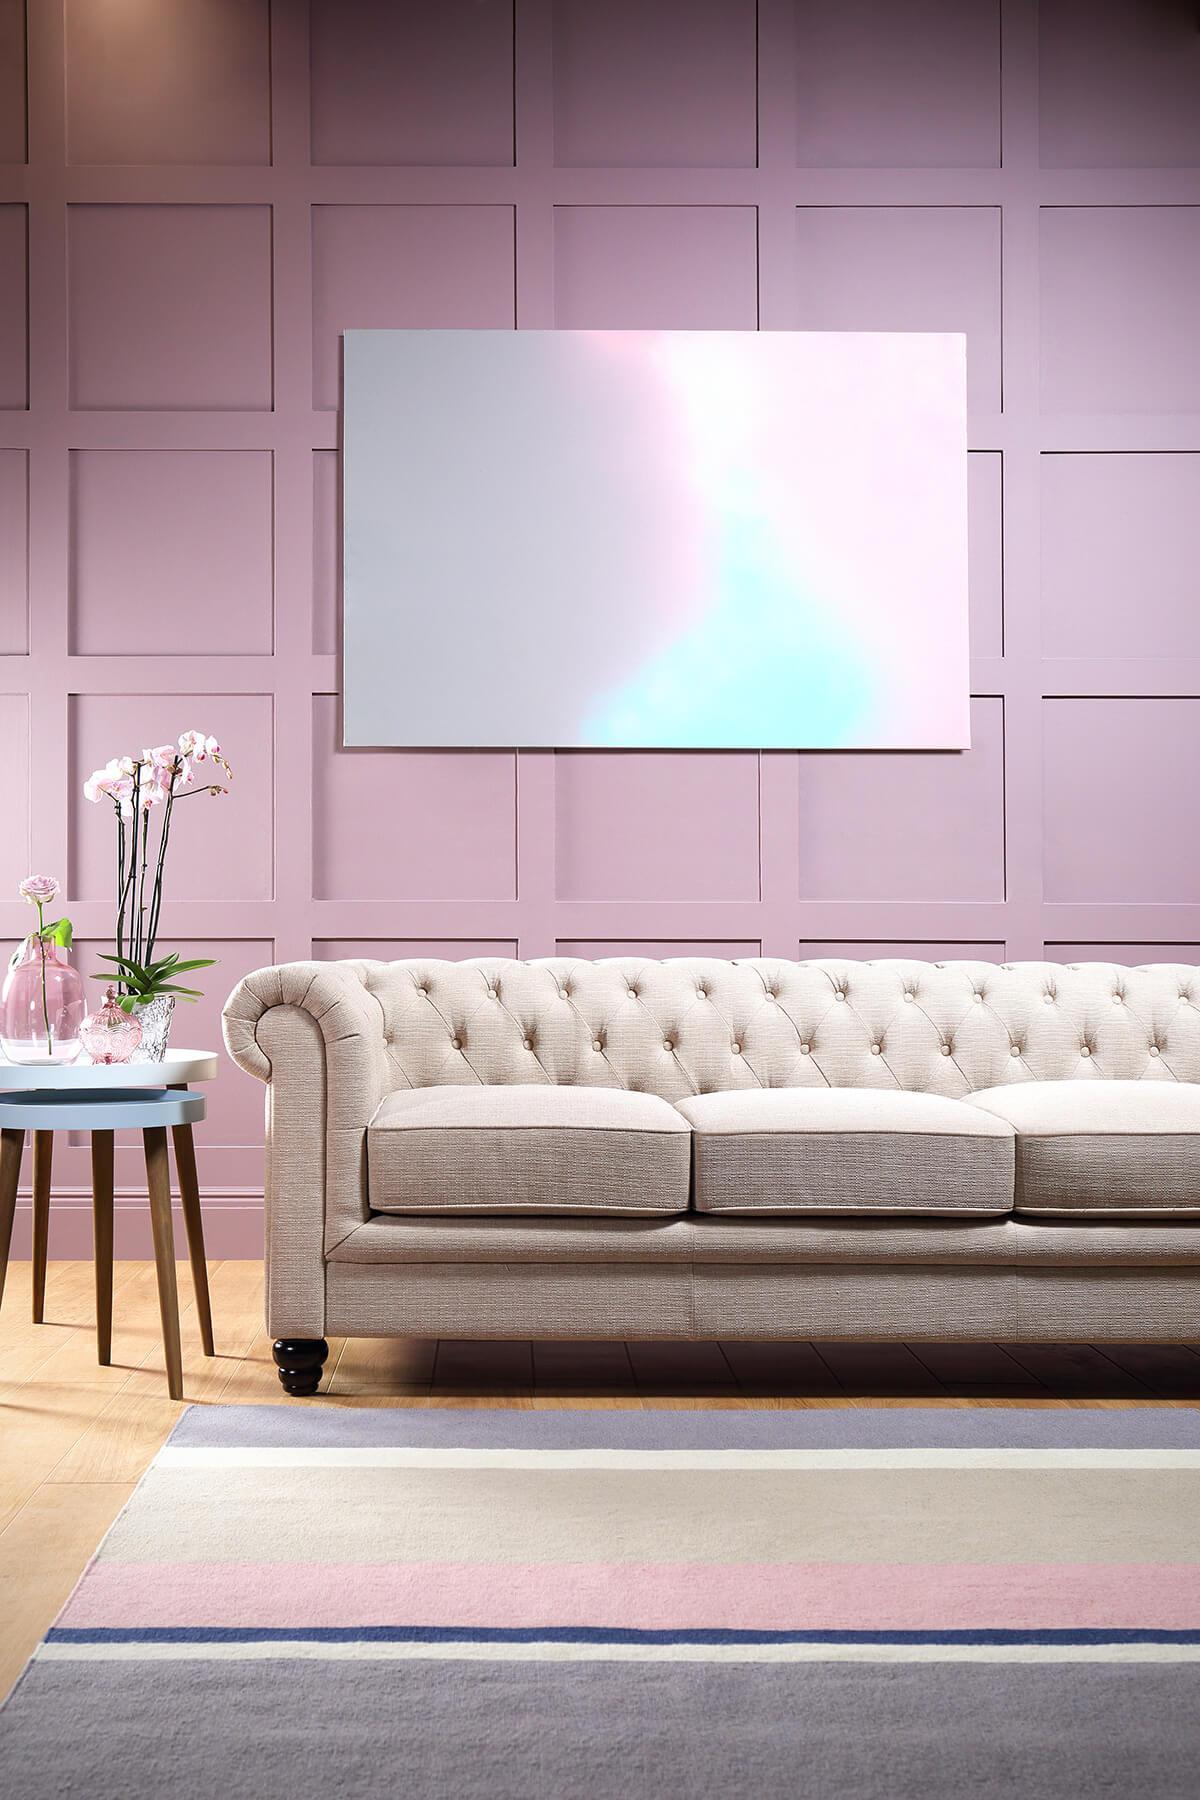 Hampton Oatmeal Fabric Chesterfield Sofa - 3 Seater